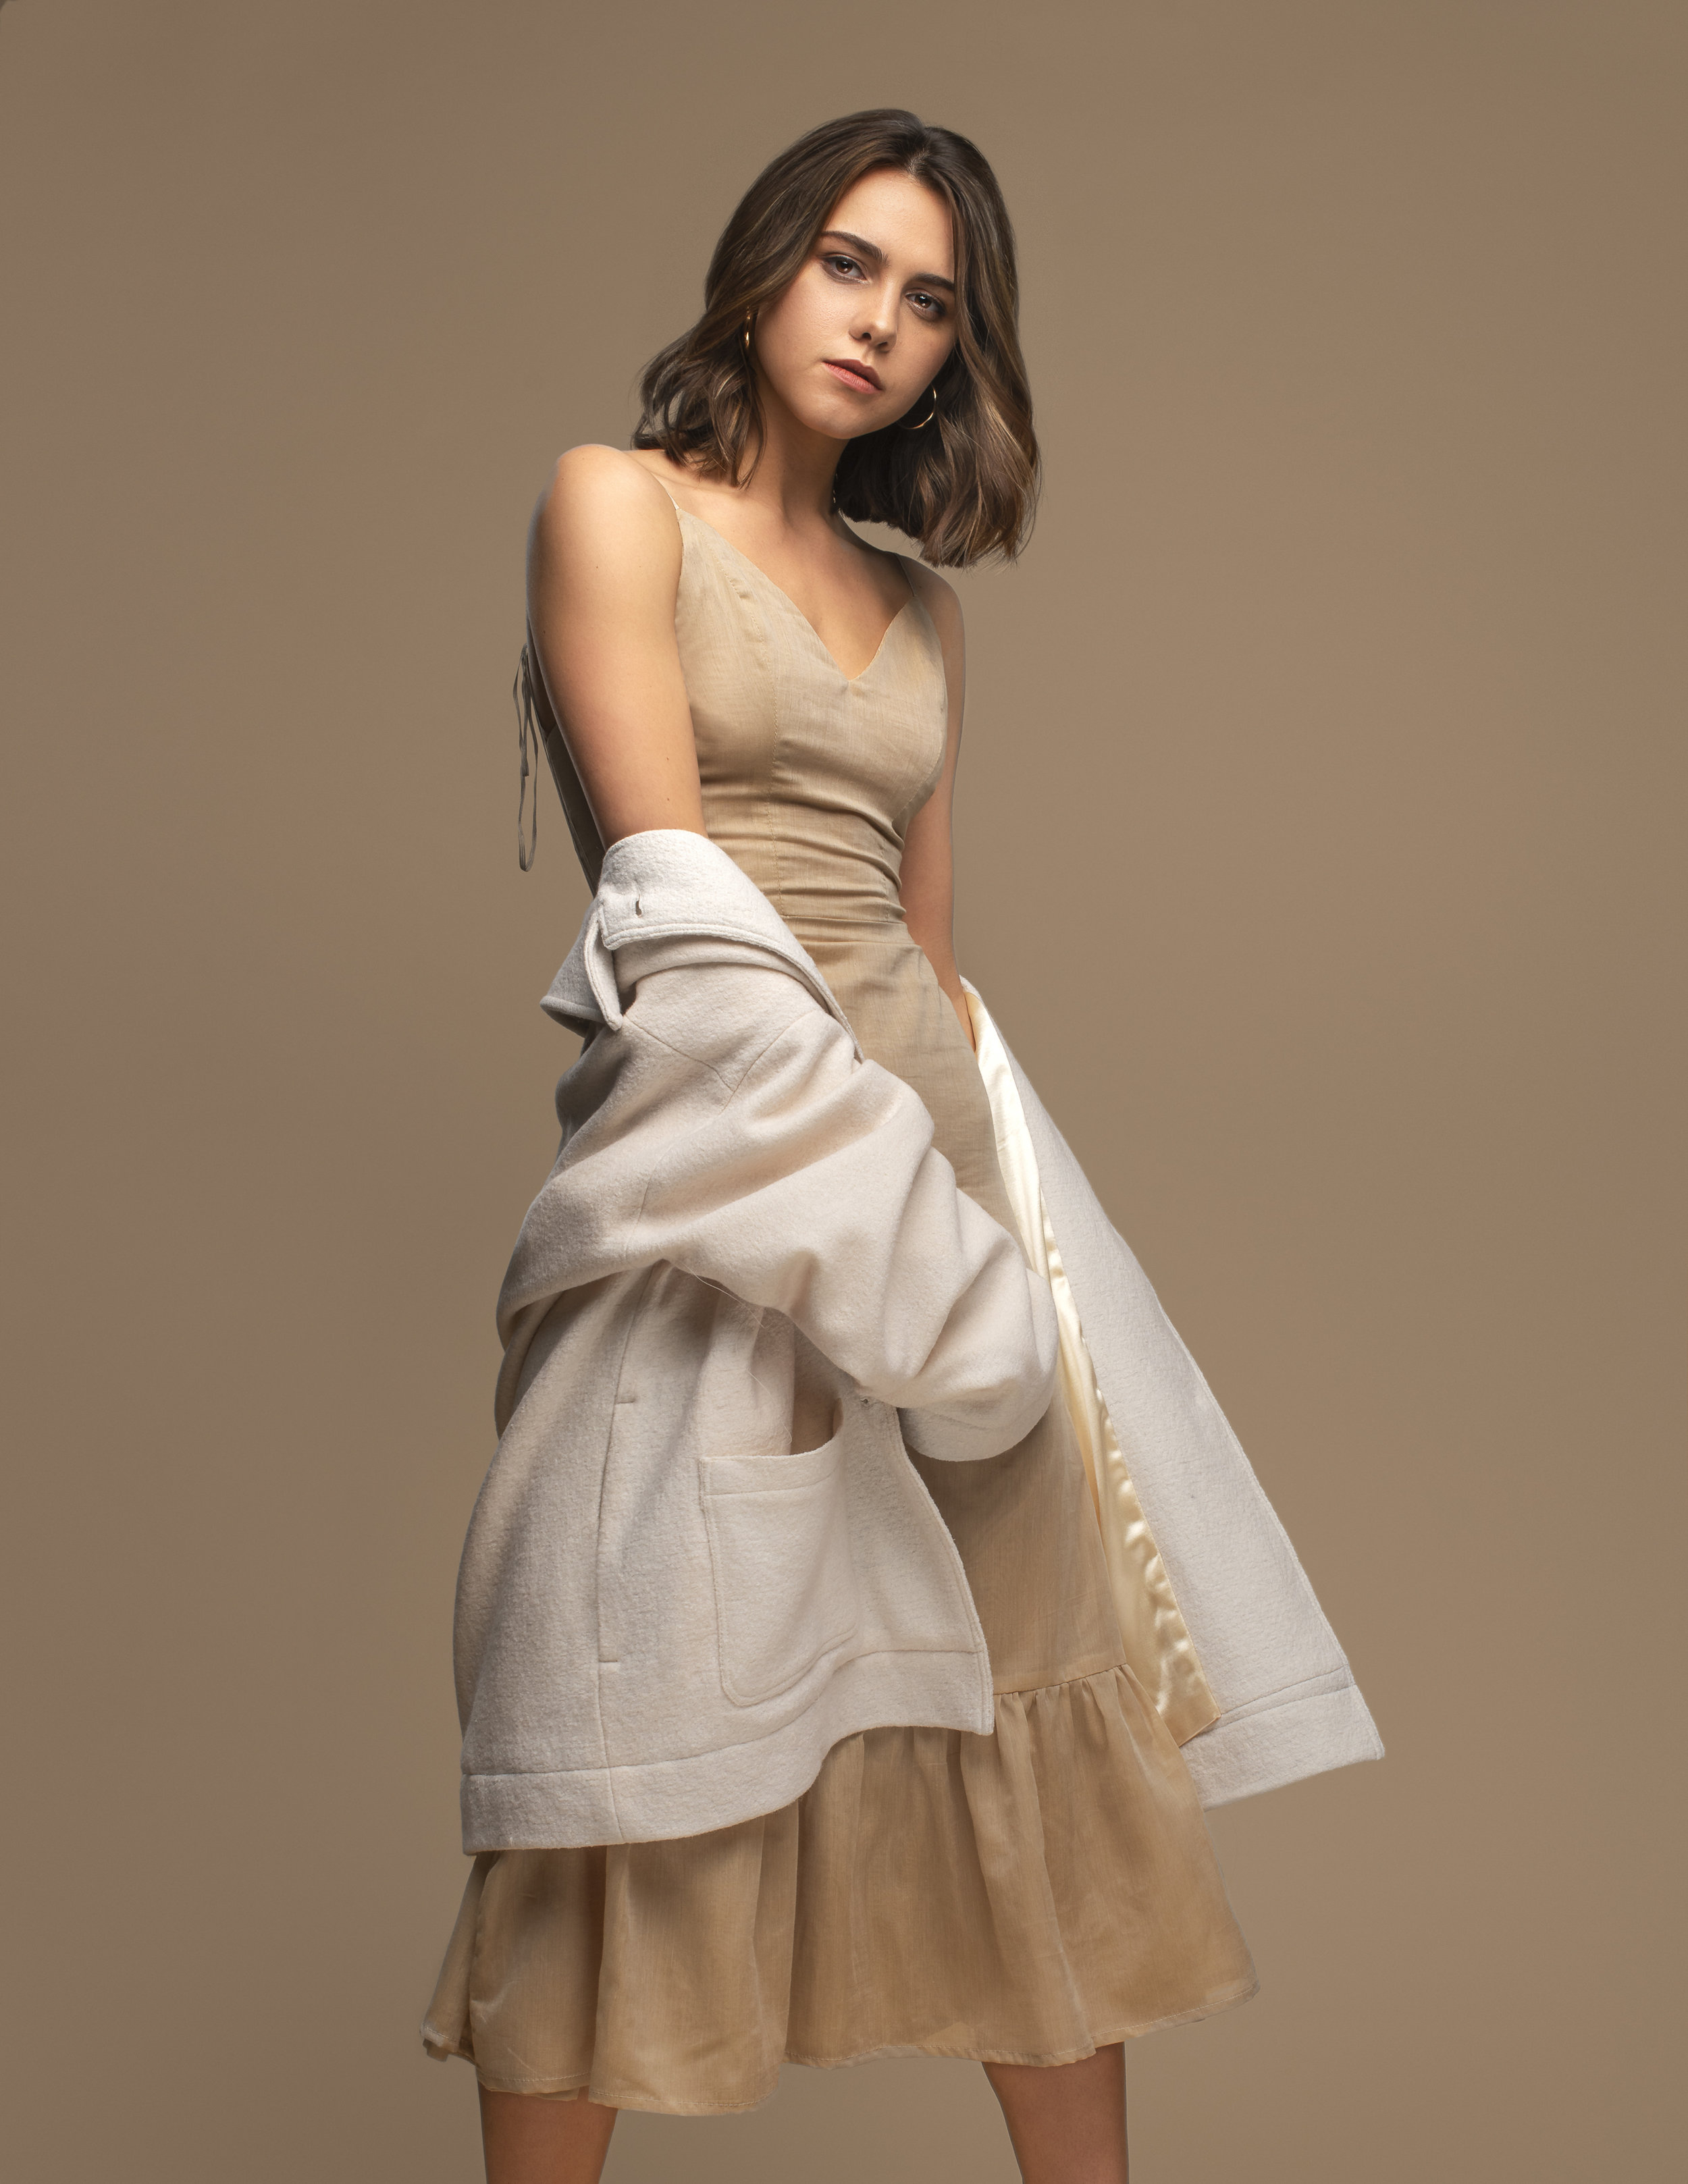 1/1 silk dress and wool coat by aleksia pavlovic